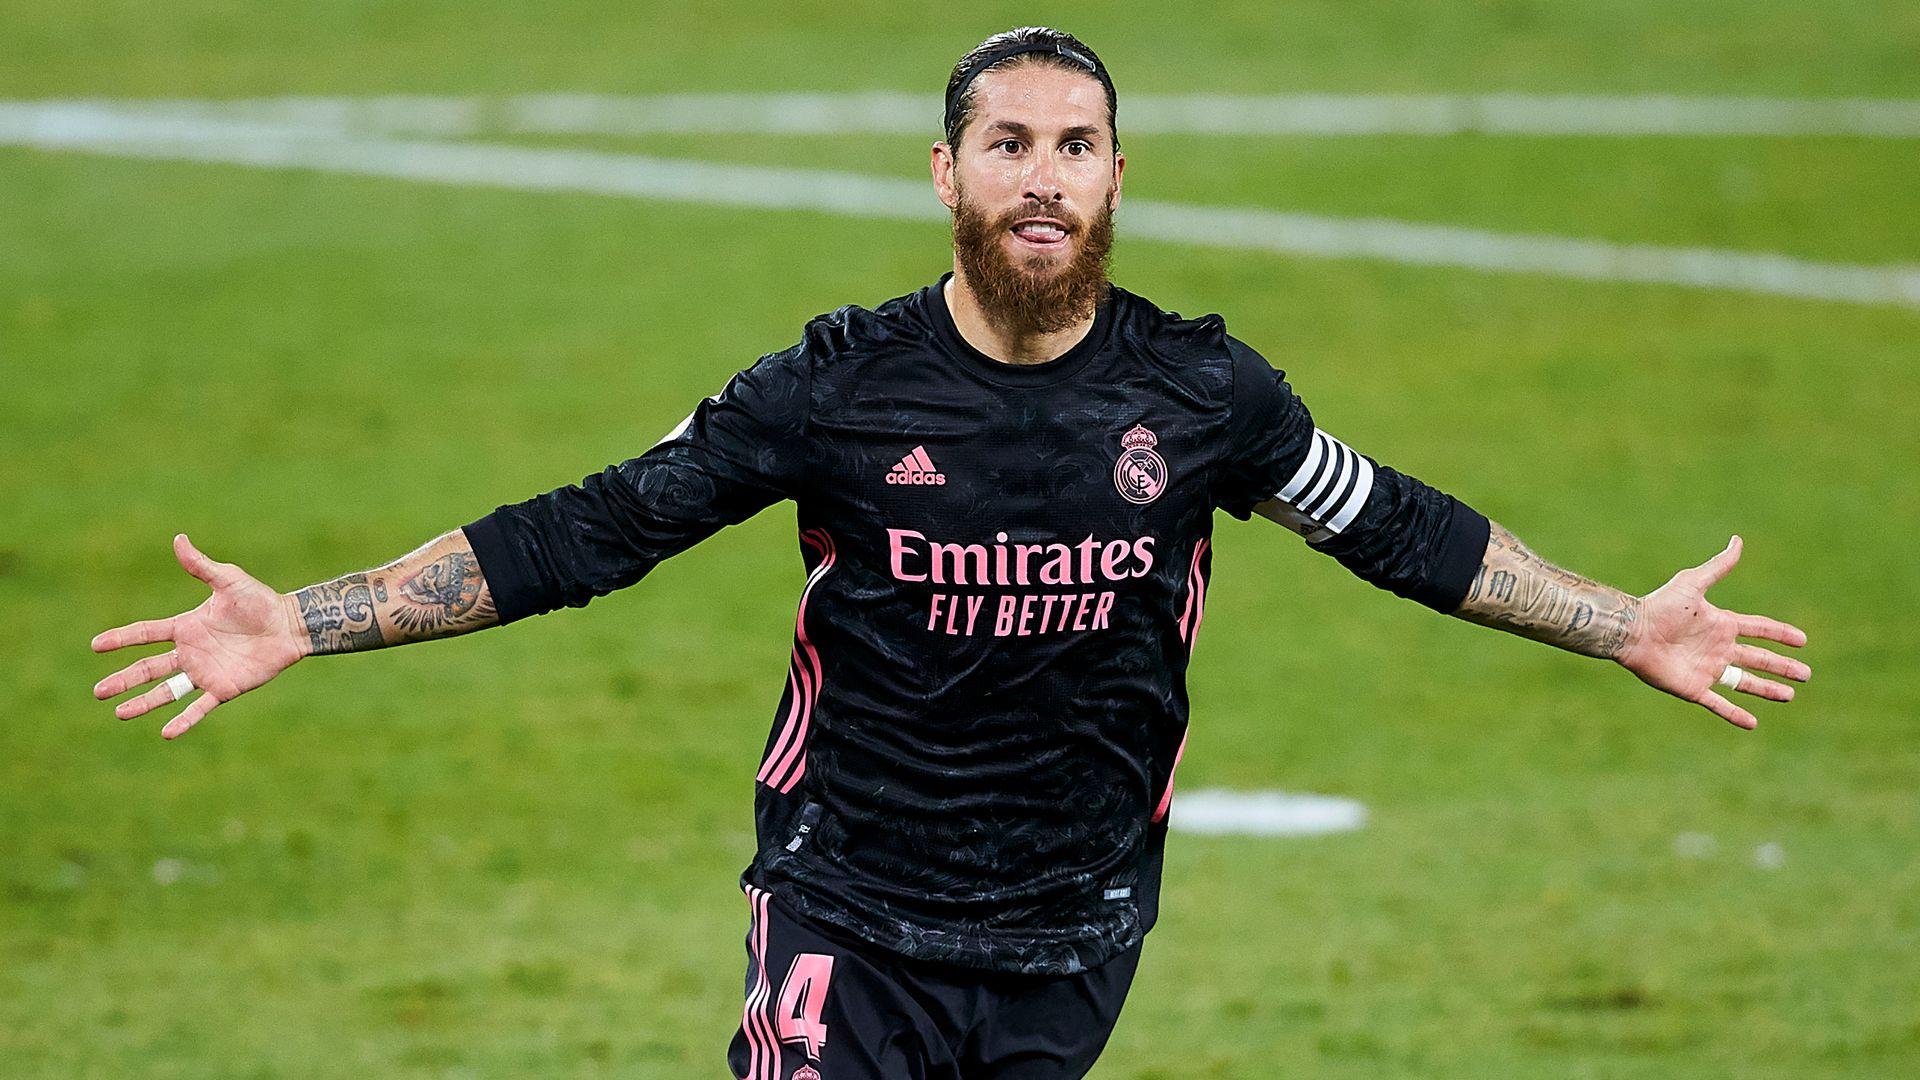 Ramos seals Real's first win of season